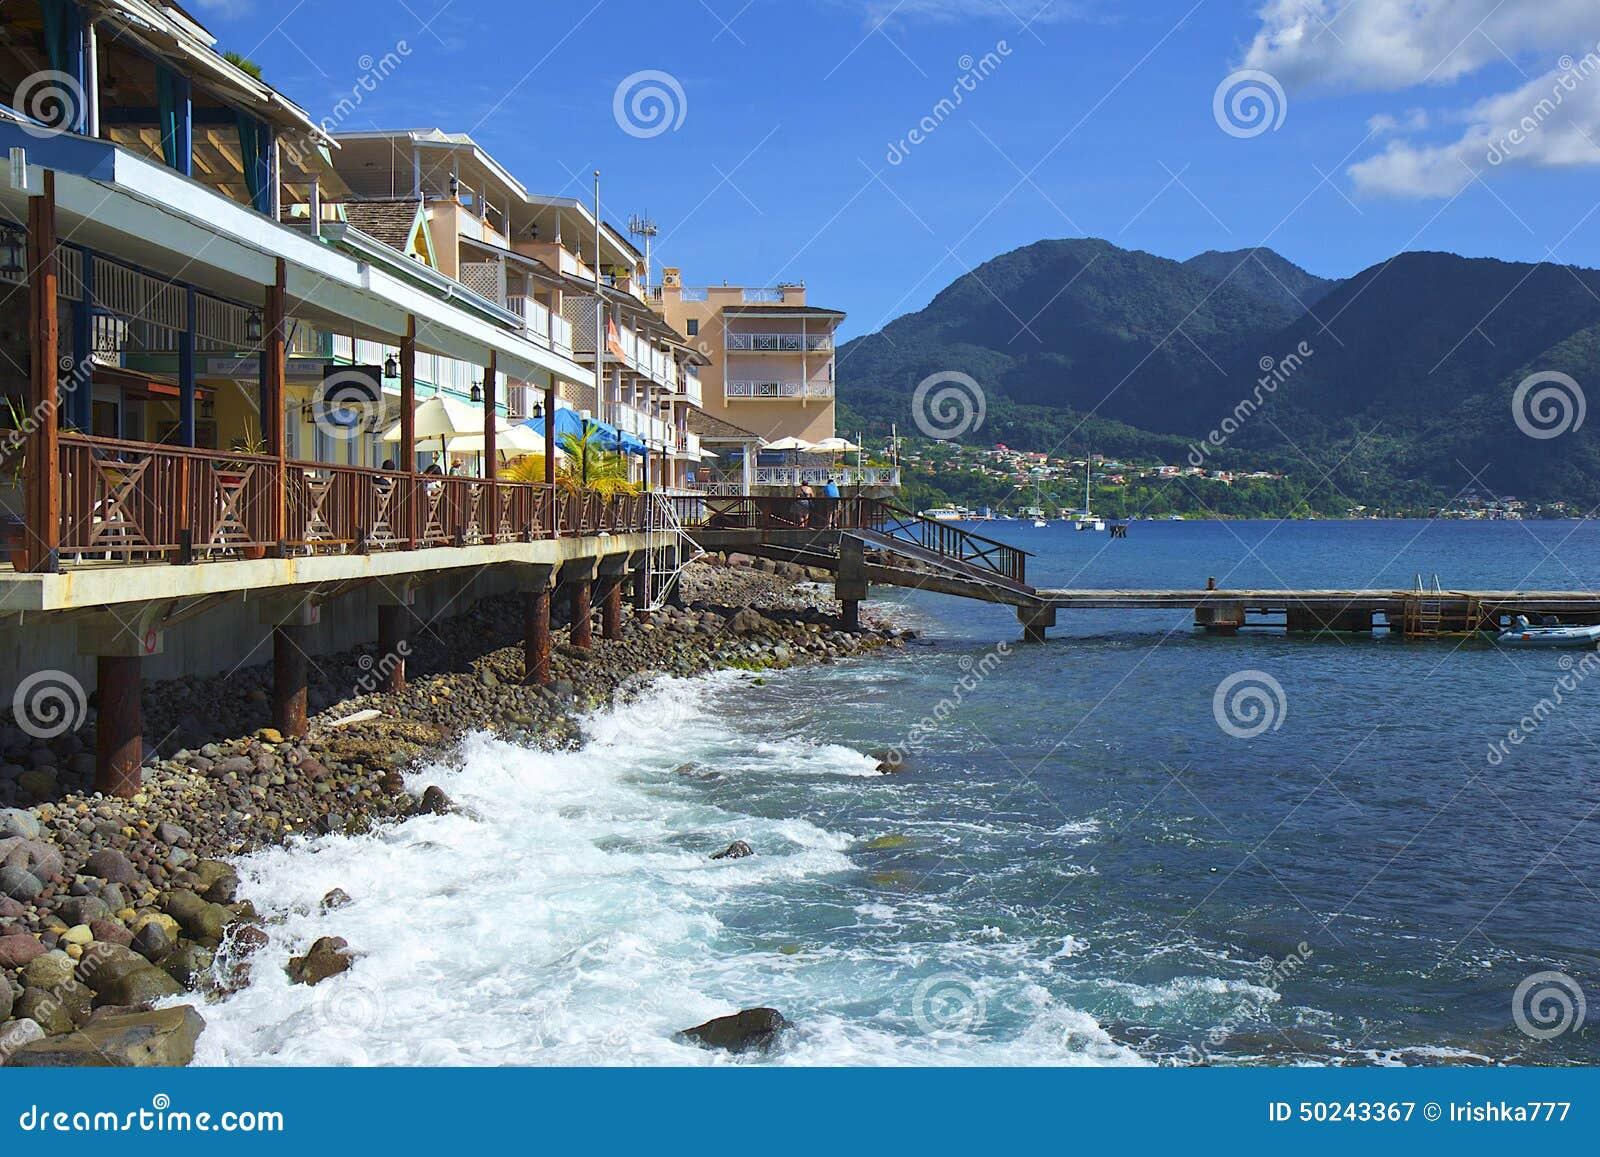 Roseauwaterkant in Caraïbisch Dominica,